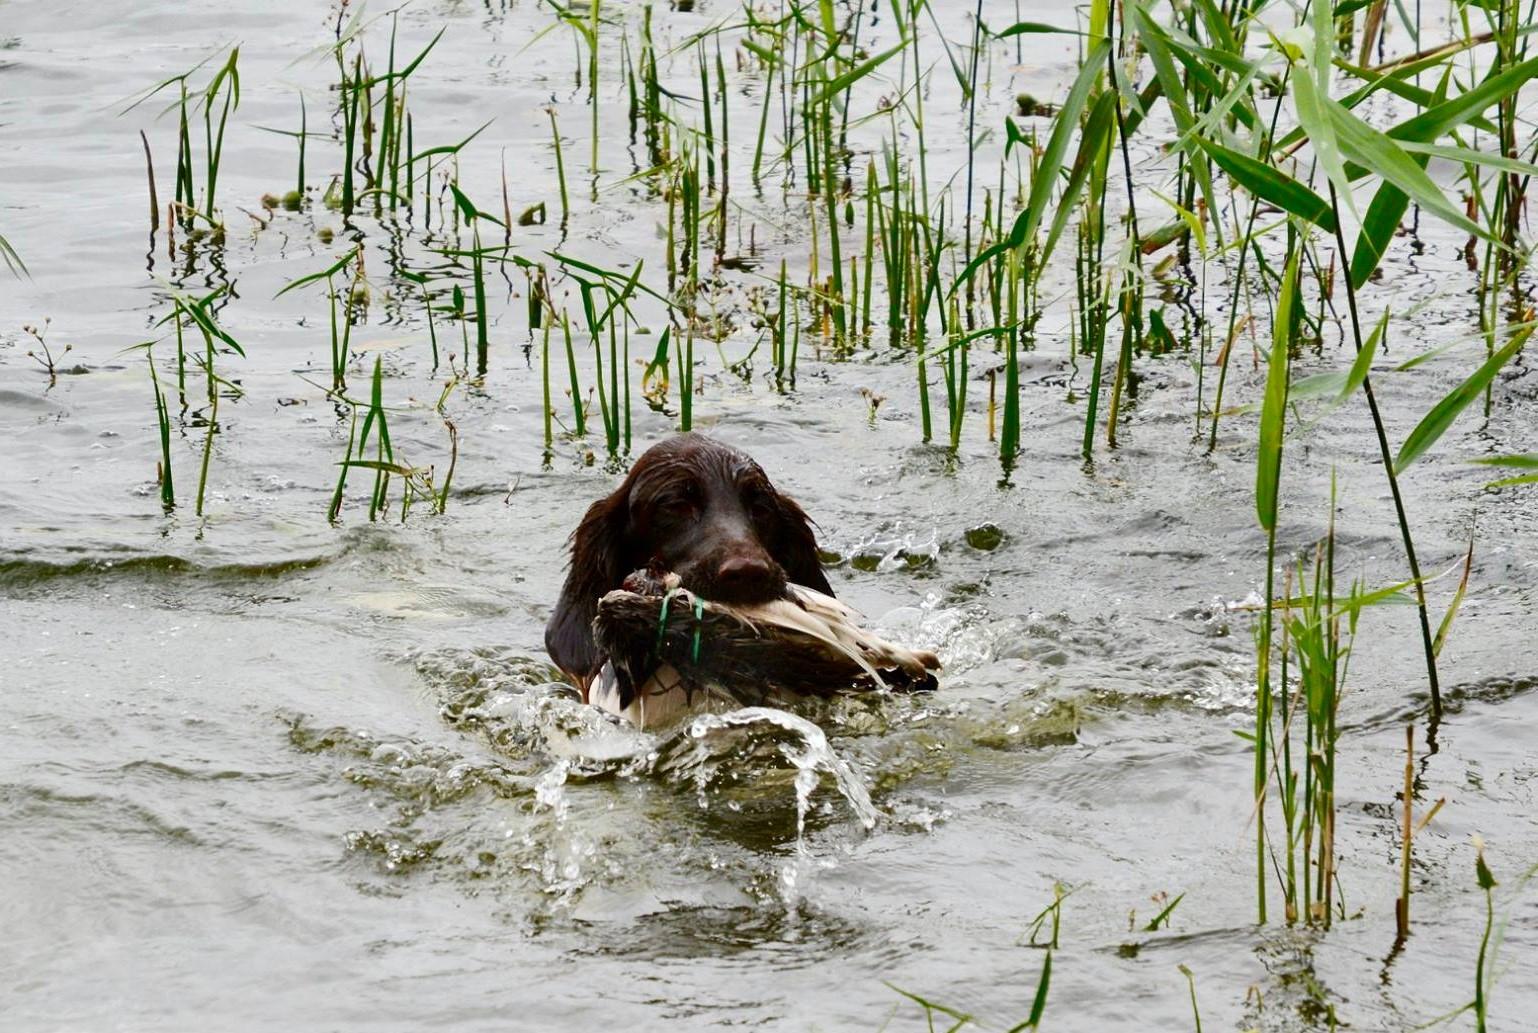 Cindy i vattnet